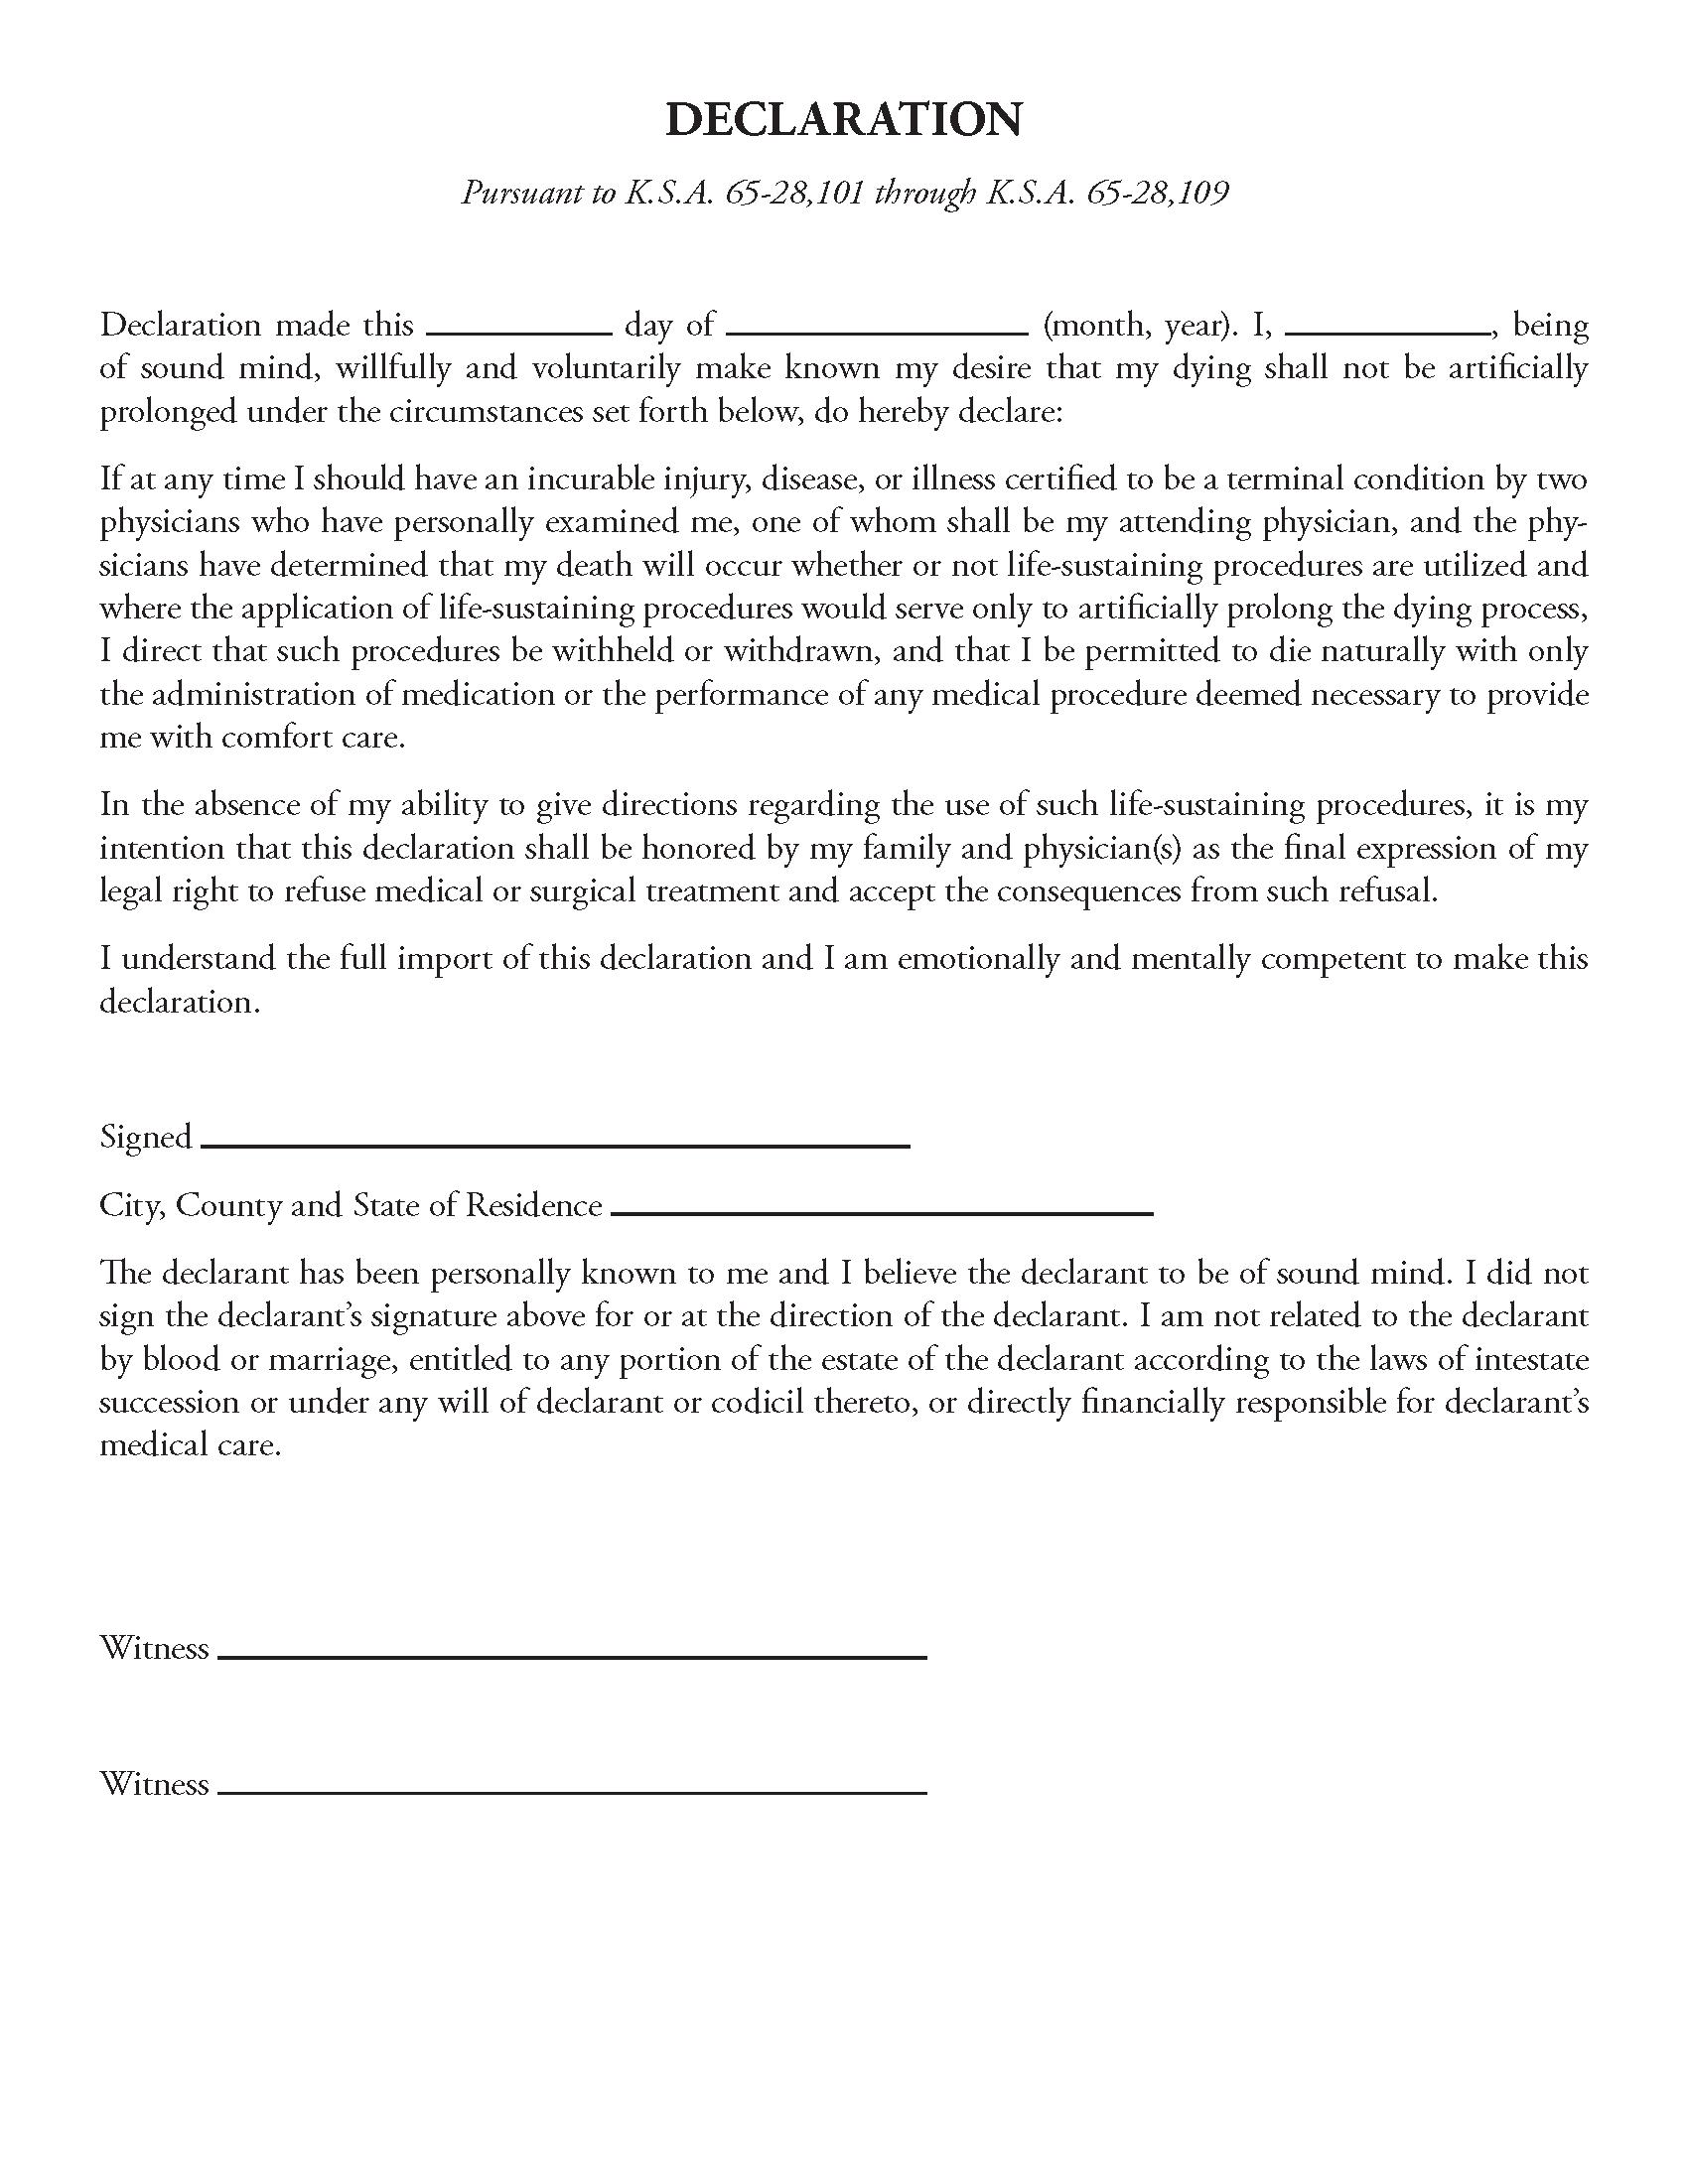 Kansas Living Will Fillable PDF Form